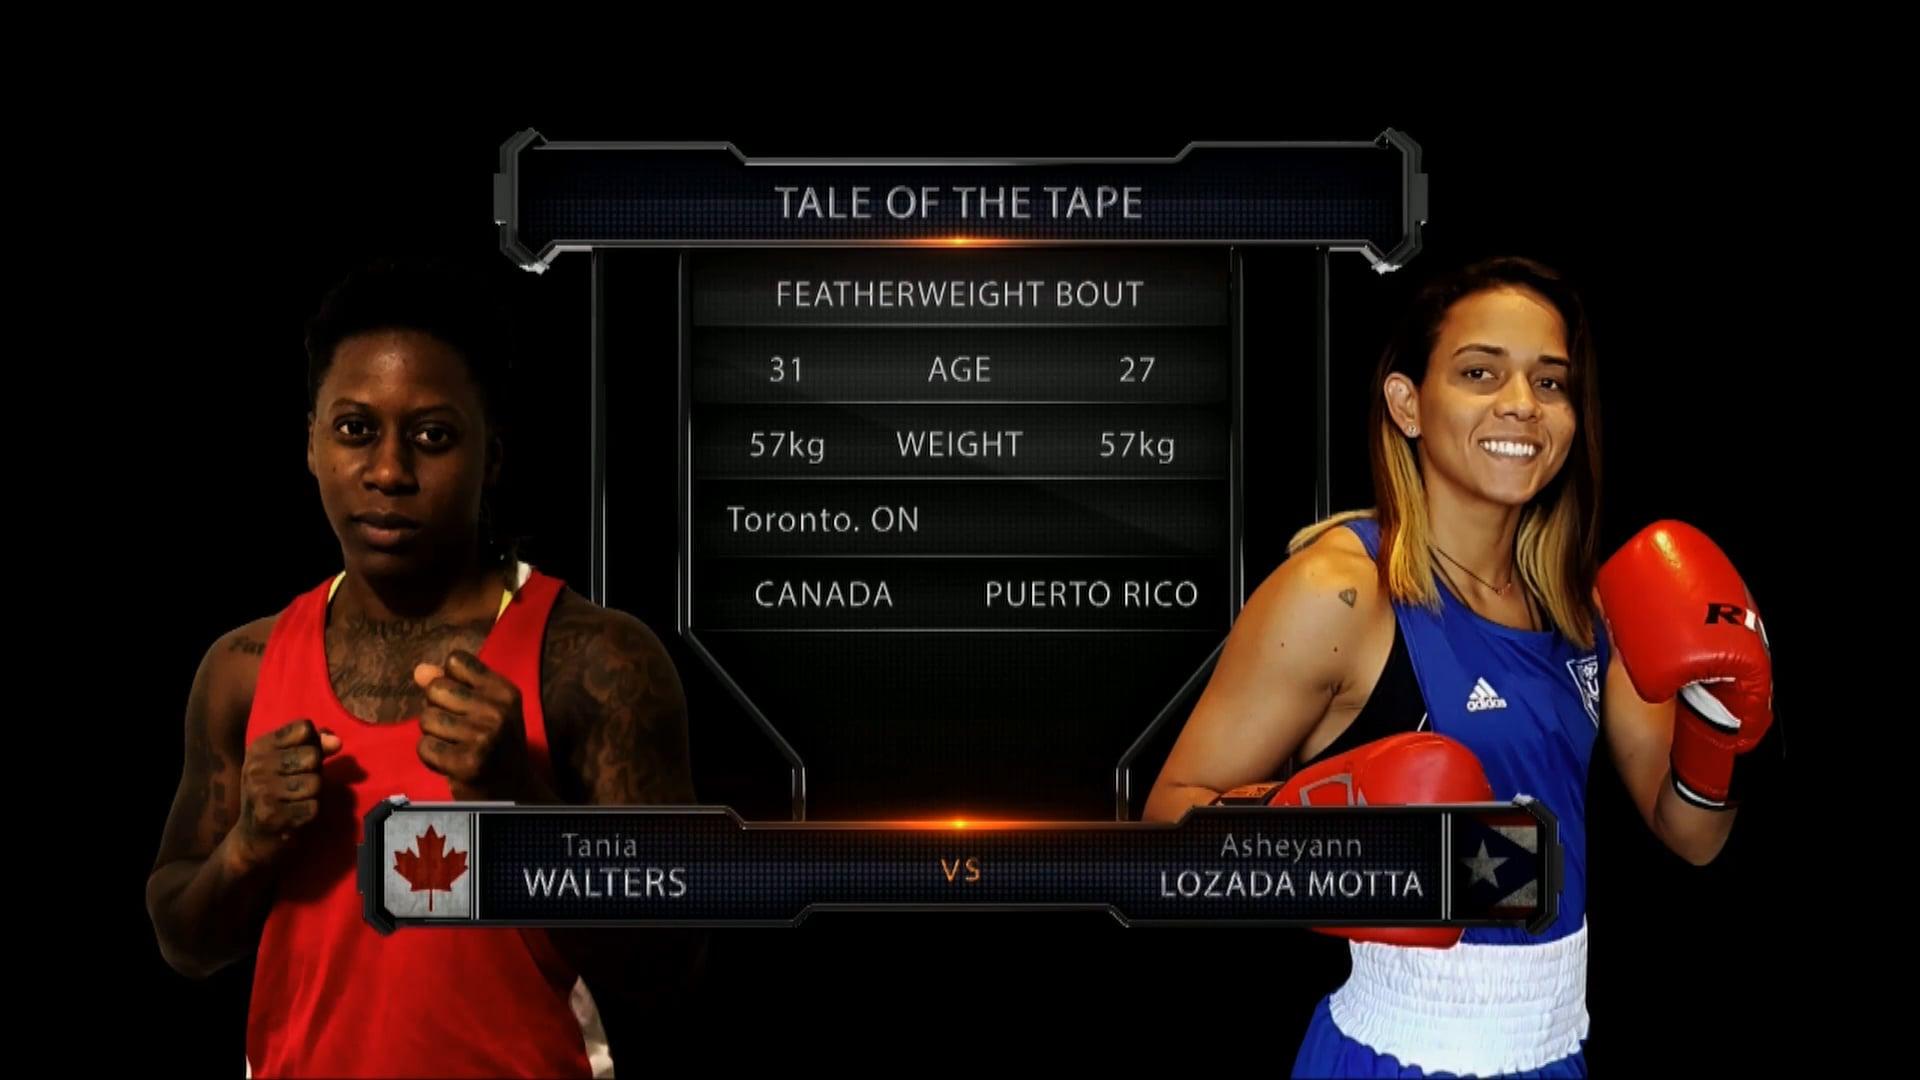 Walters (CAN) vs Lozada Motta (PR)